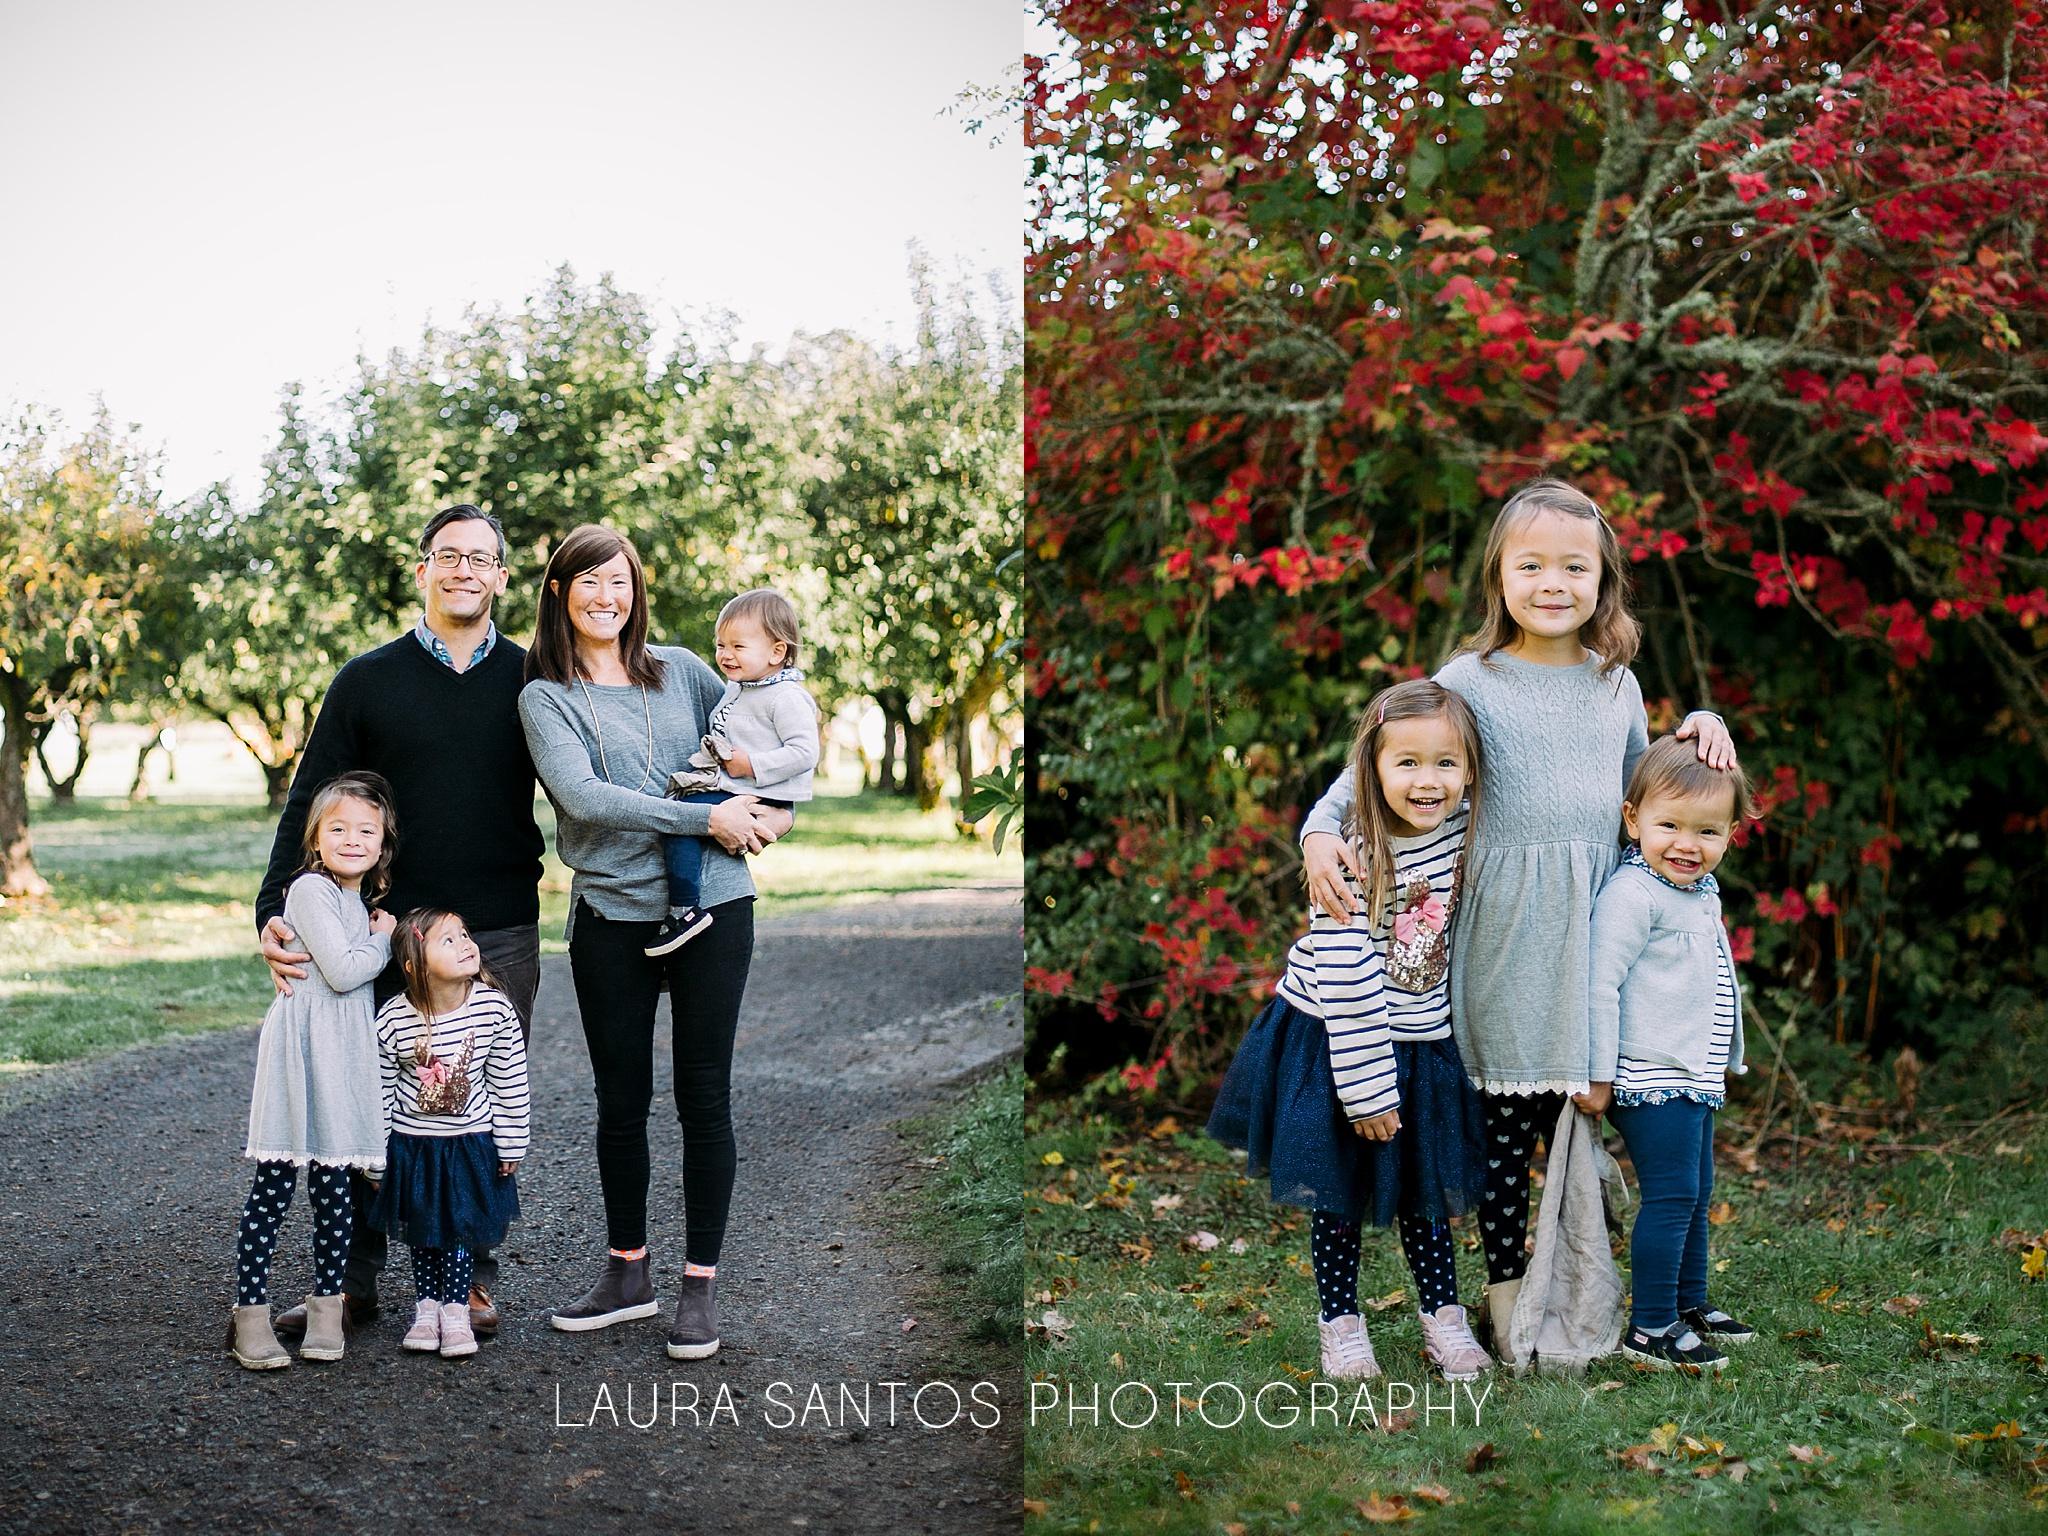 Laura Santos Photography Portland Oregon Family Photographer_0541.jpg